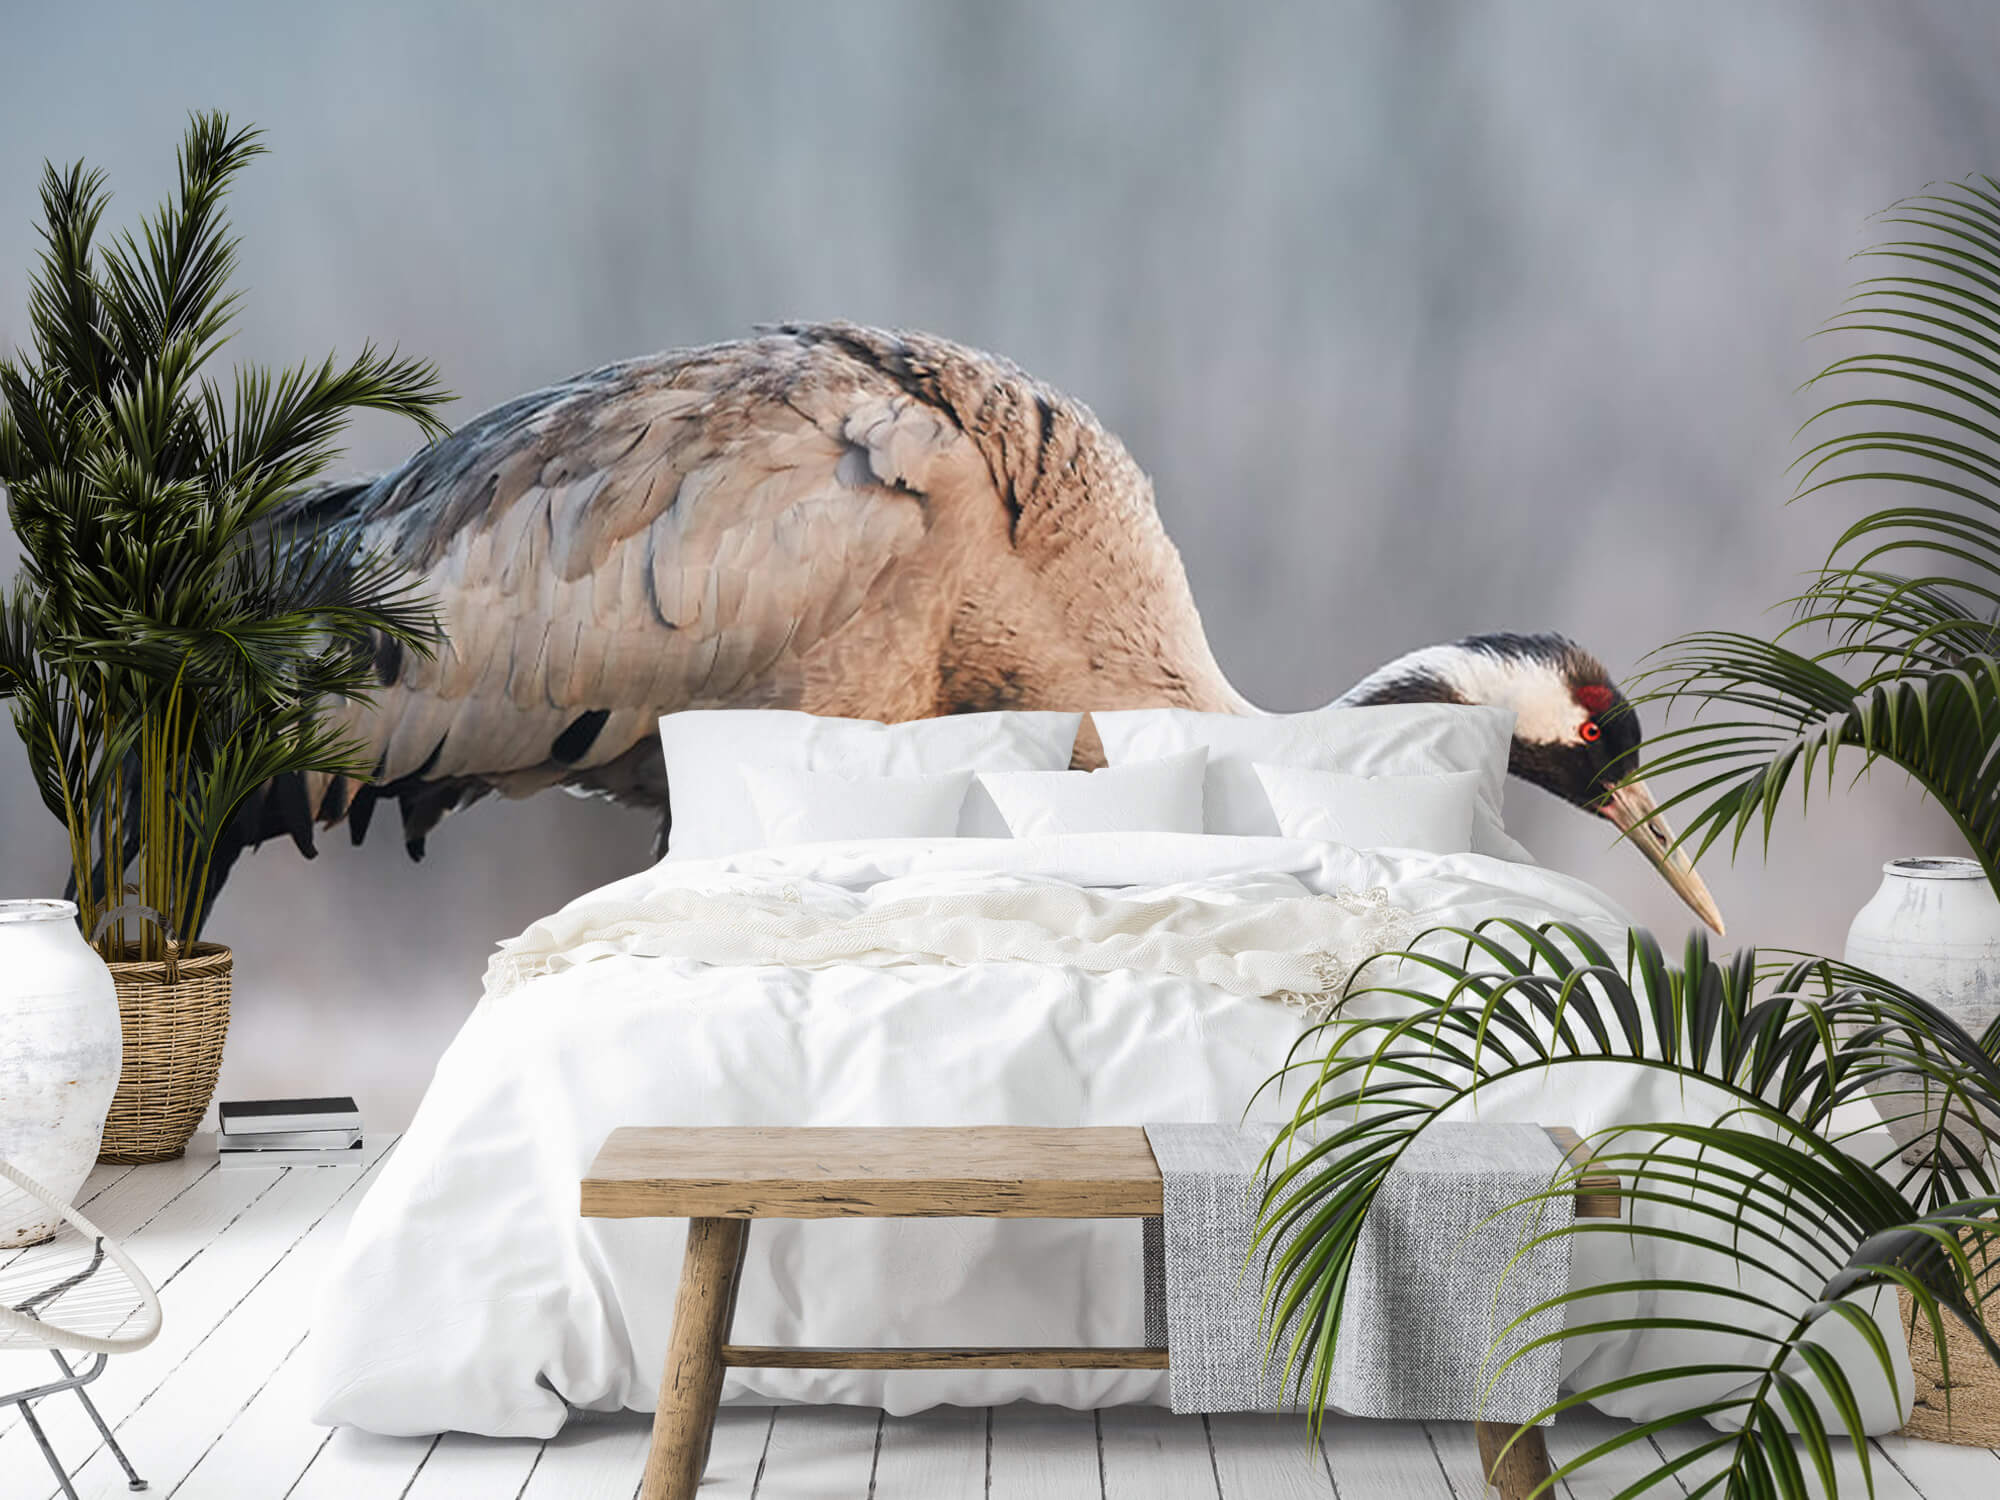 Kraanvogel in de ochtend 10